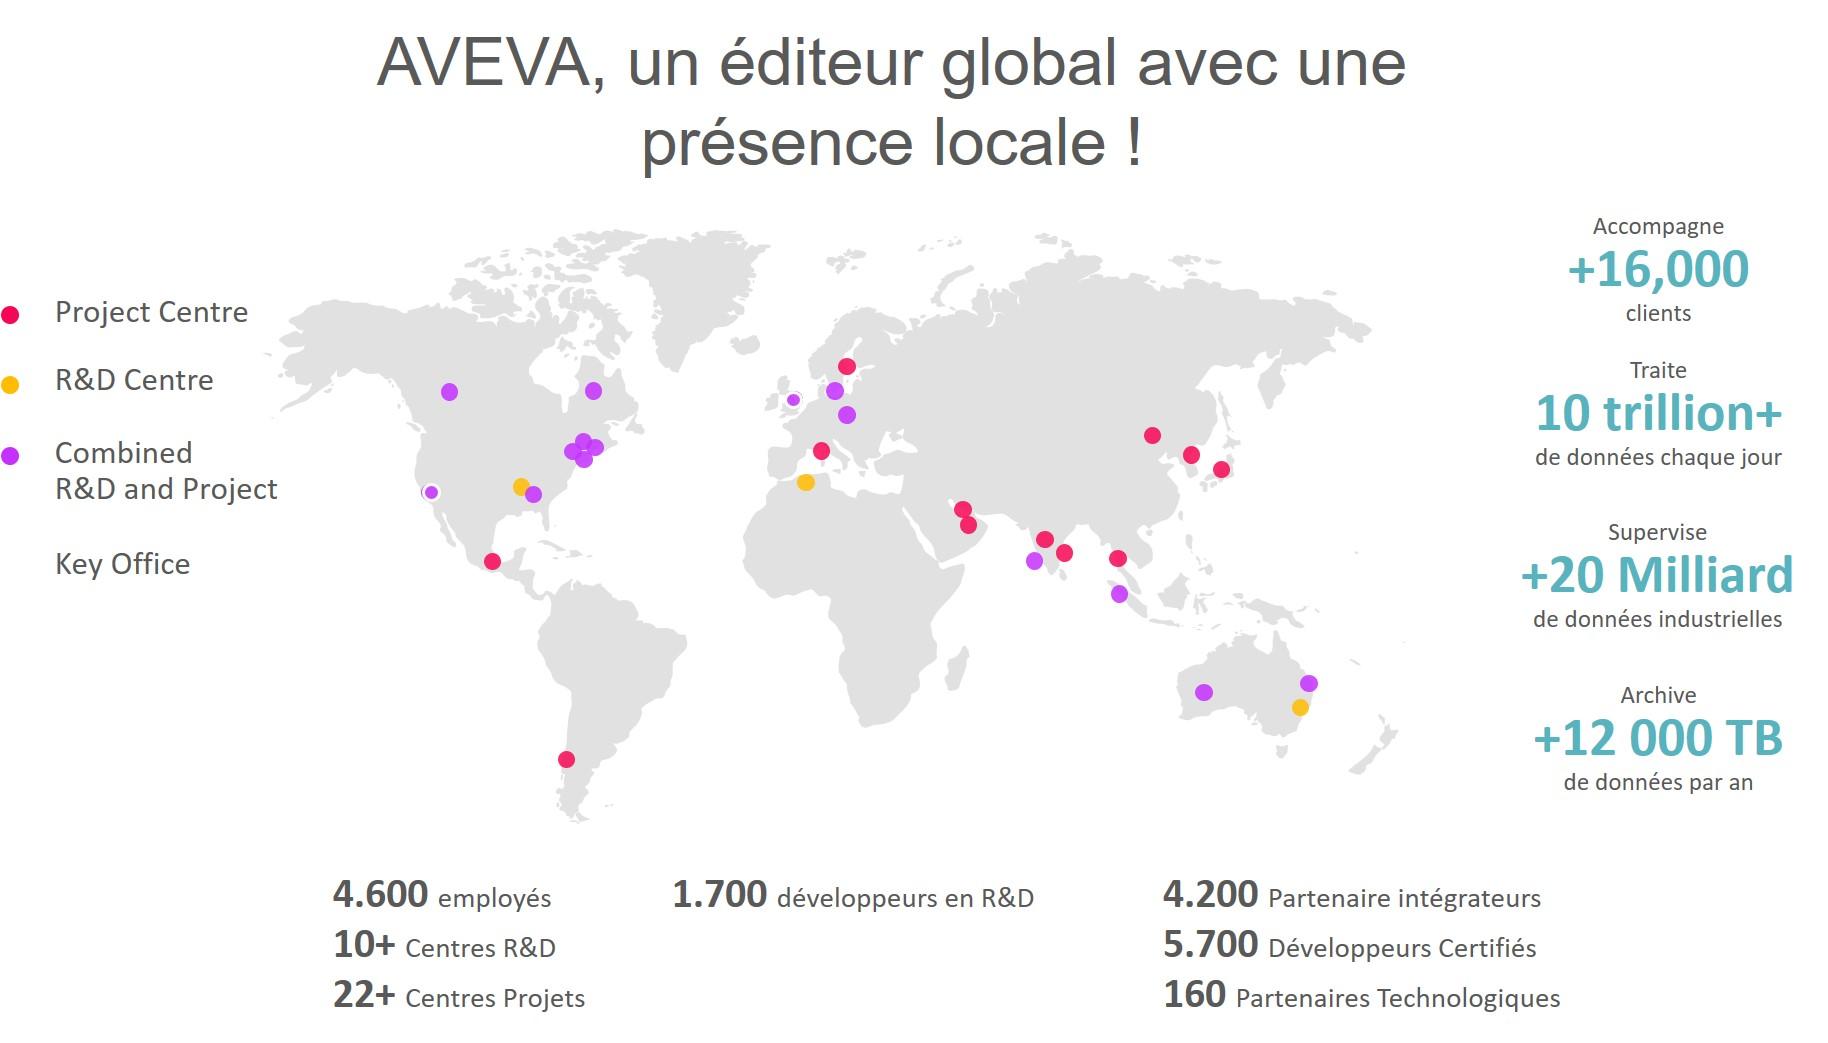 AVEVA-Worldwide-2020